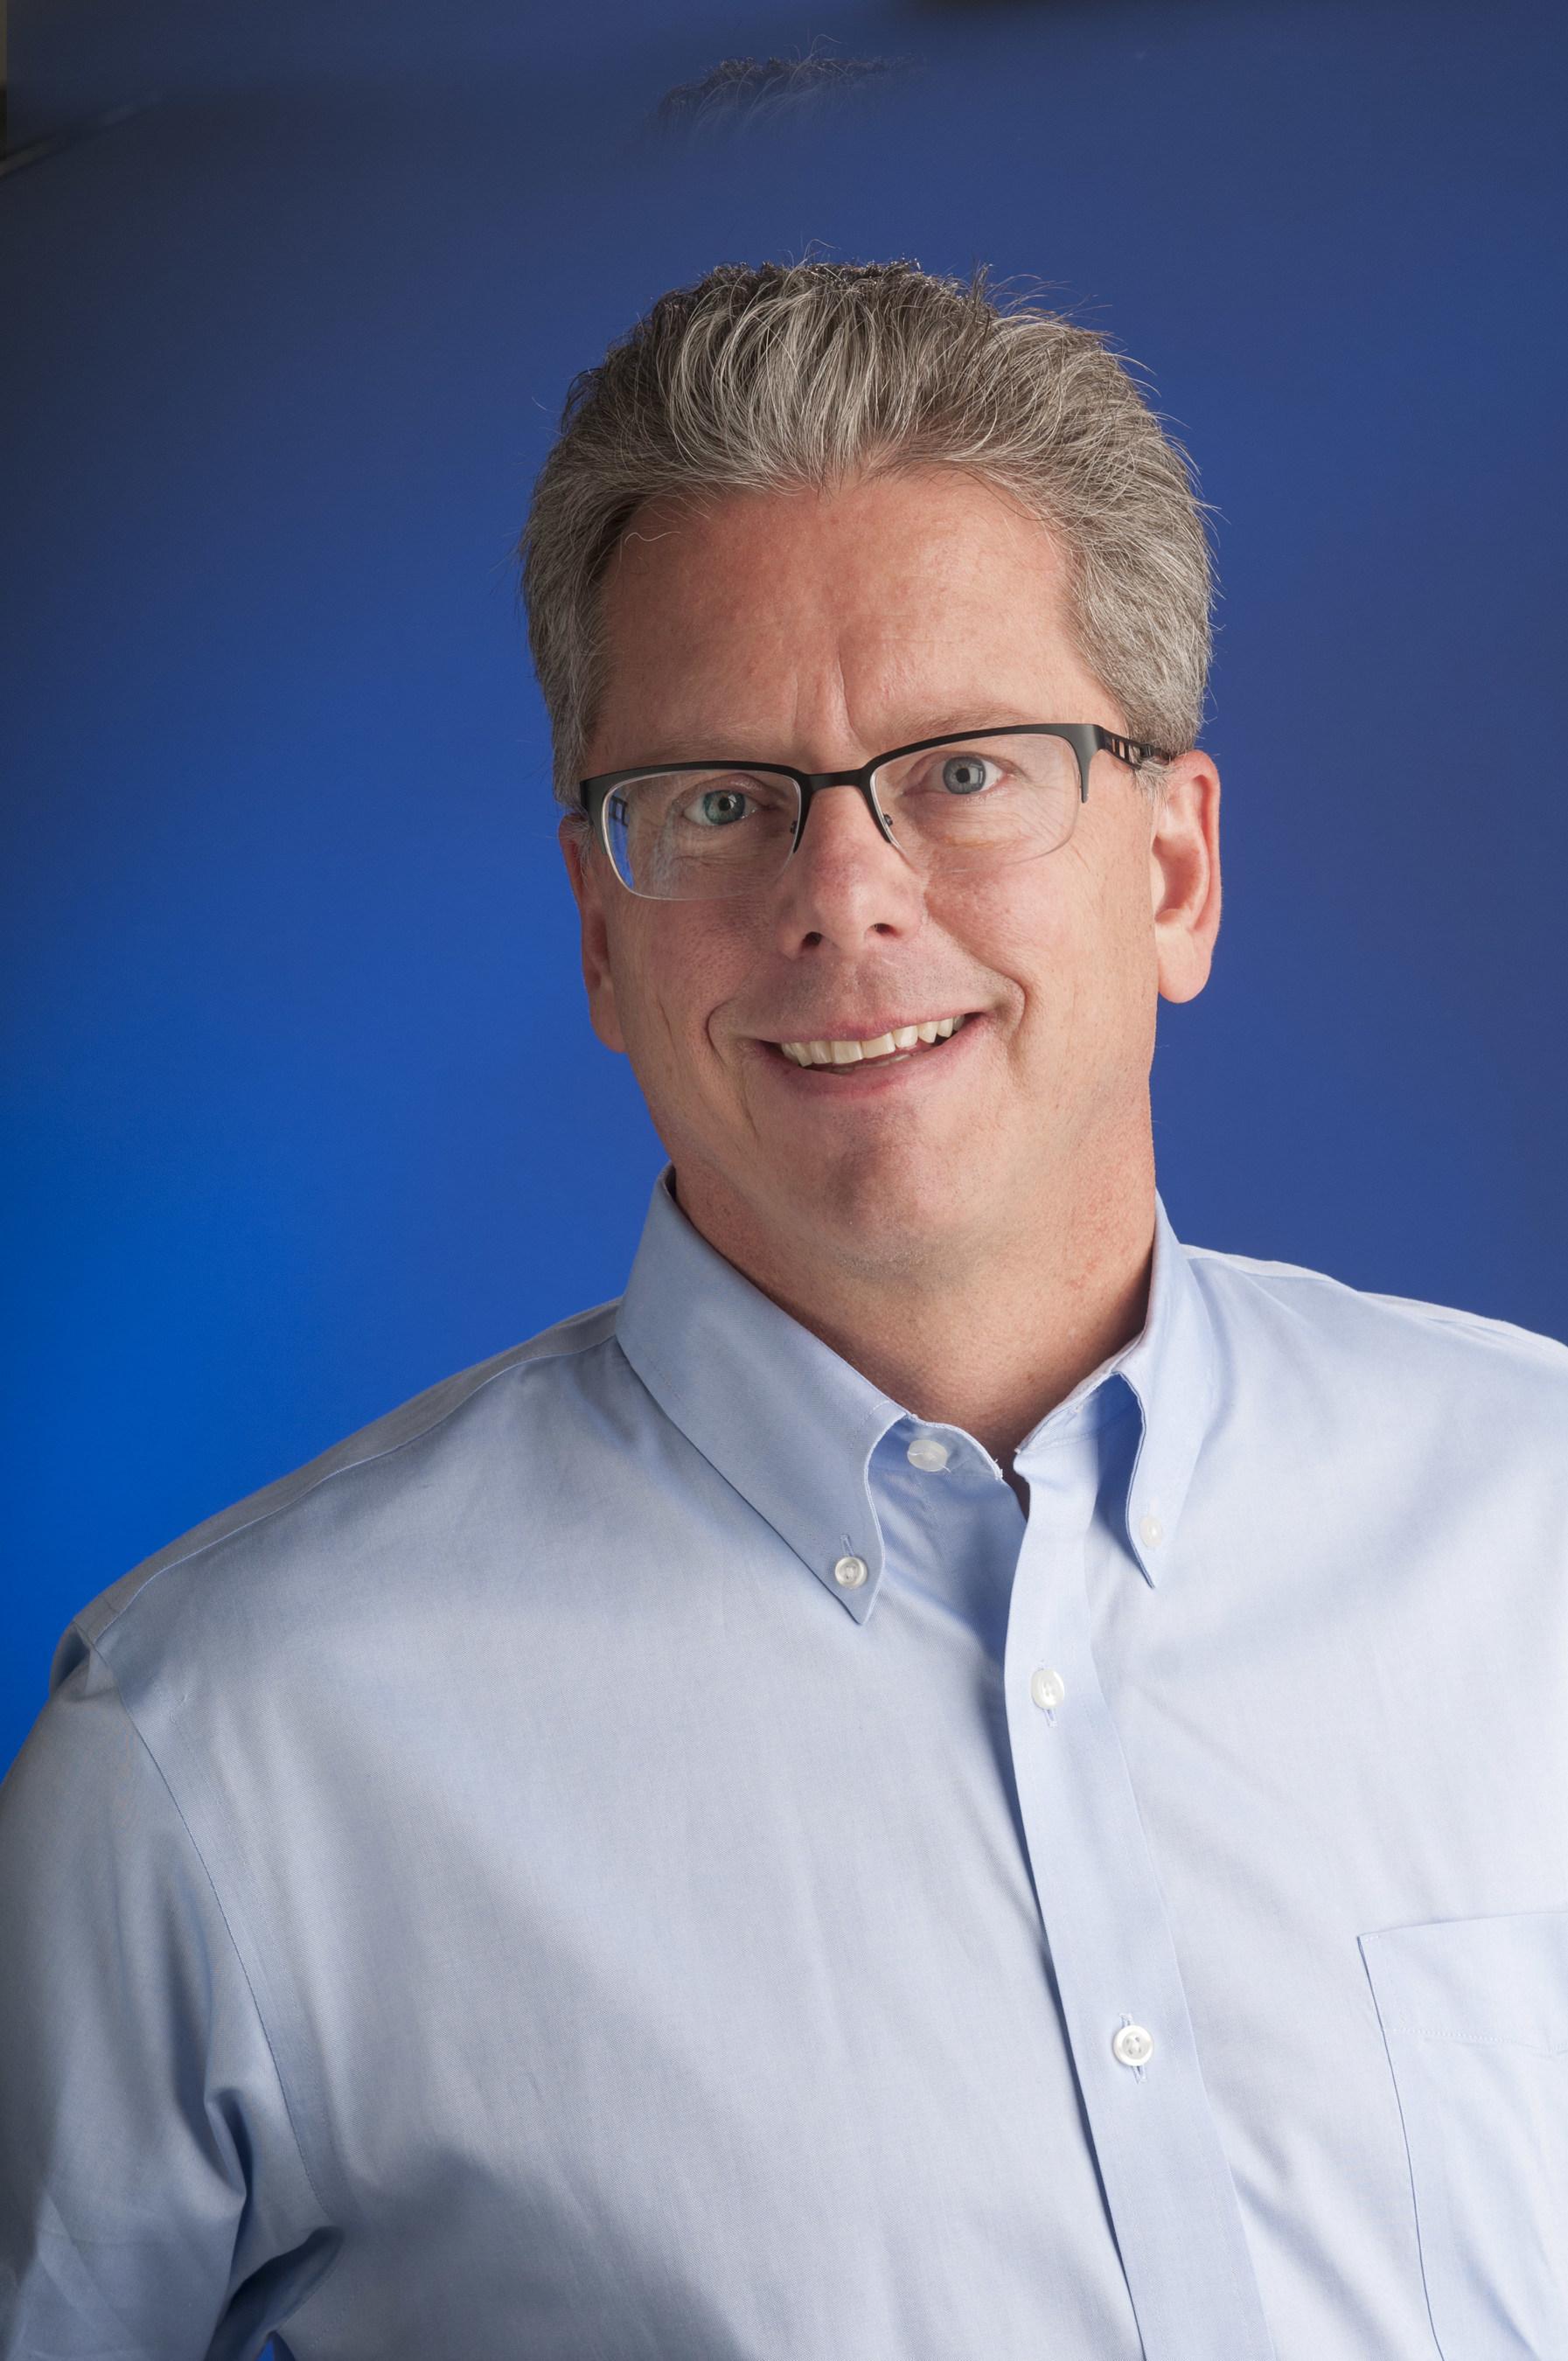 AIAA names Ball Aerospace Employees John Troeltzsch and Christopher Zeller as Associate Fellows